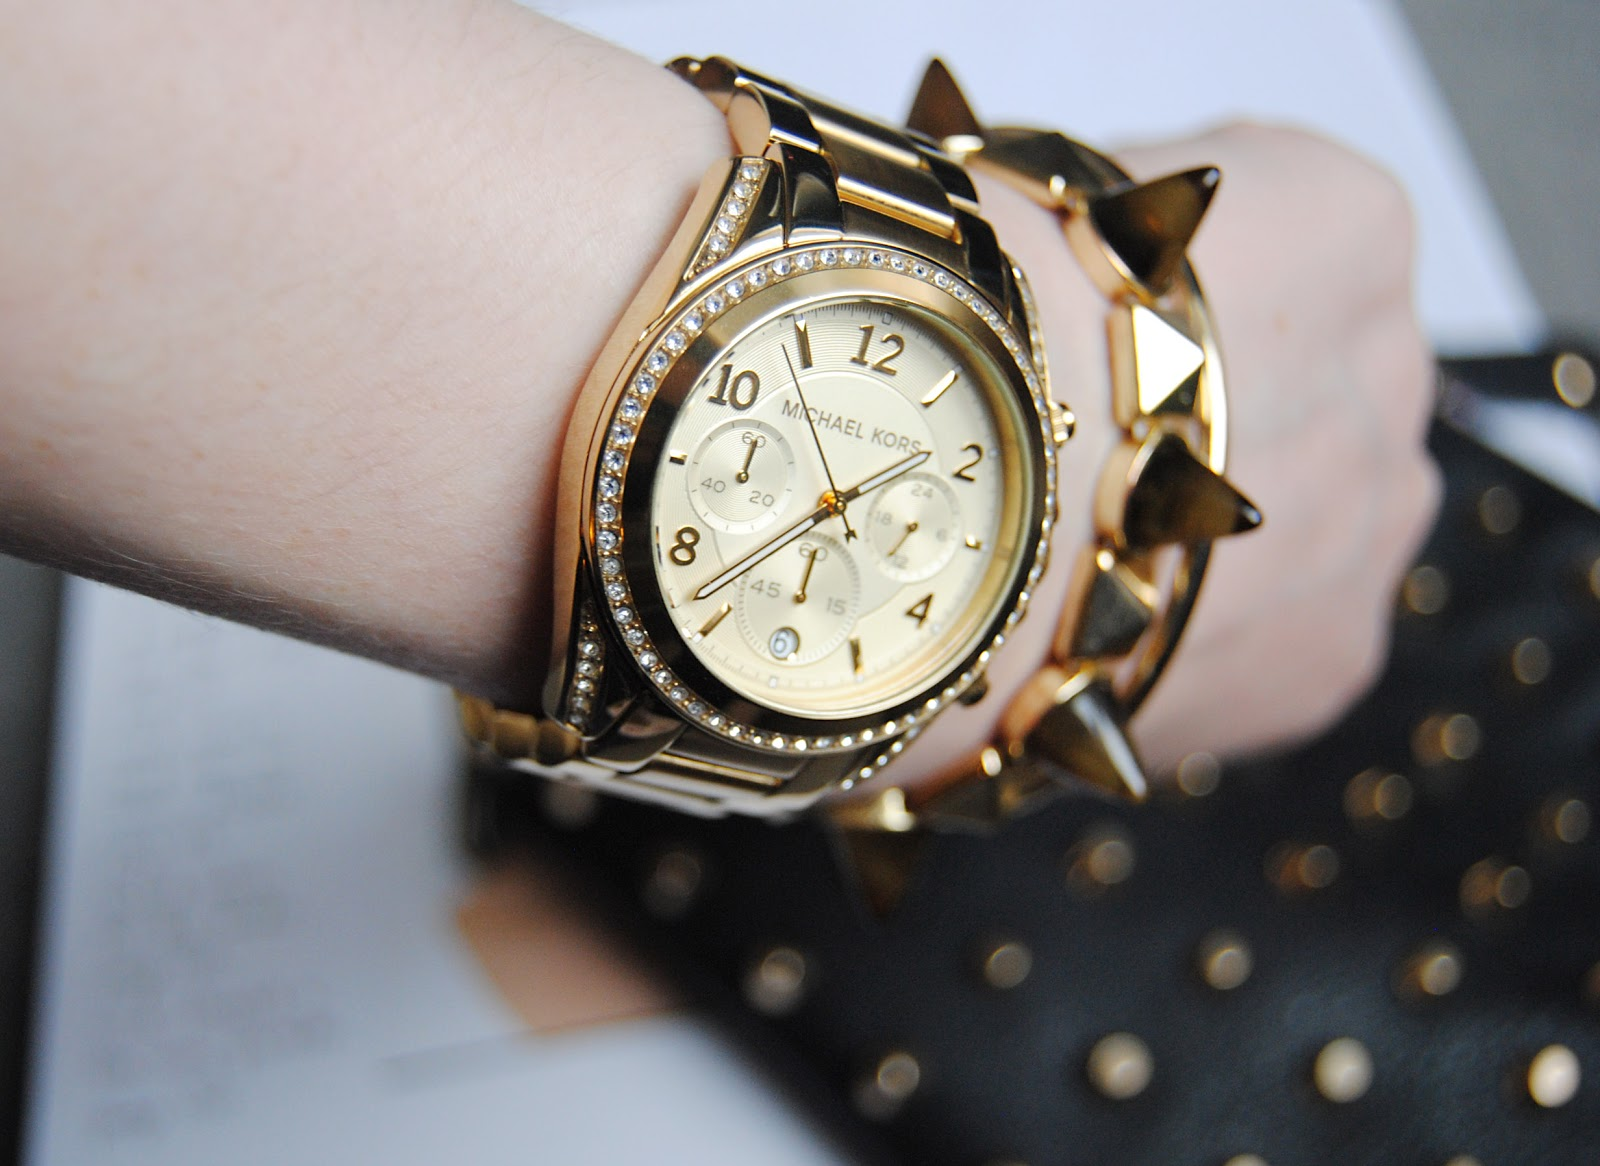 michael kors rose gold watch for women. Black Bedroom Furniture Sets. Home Design Ideas